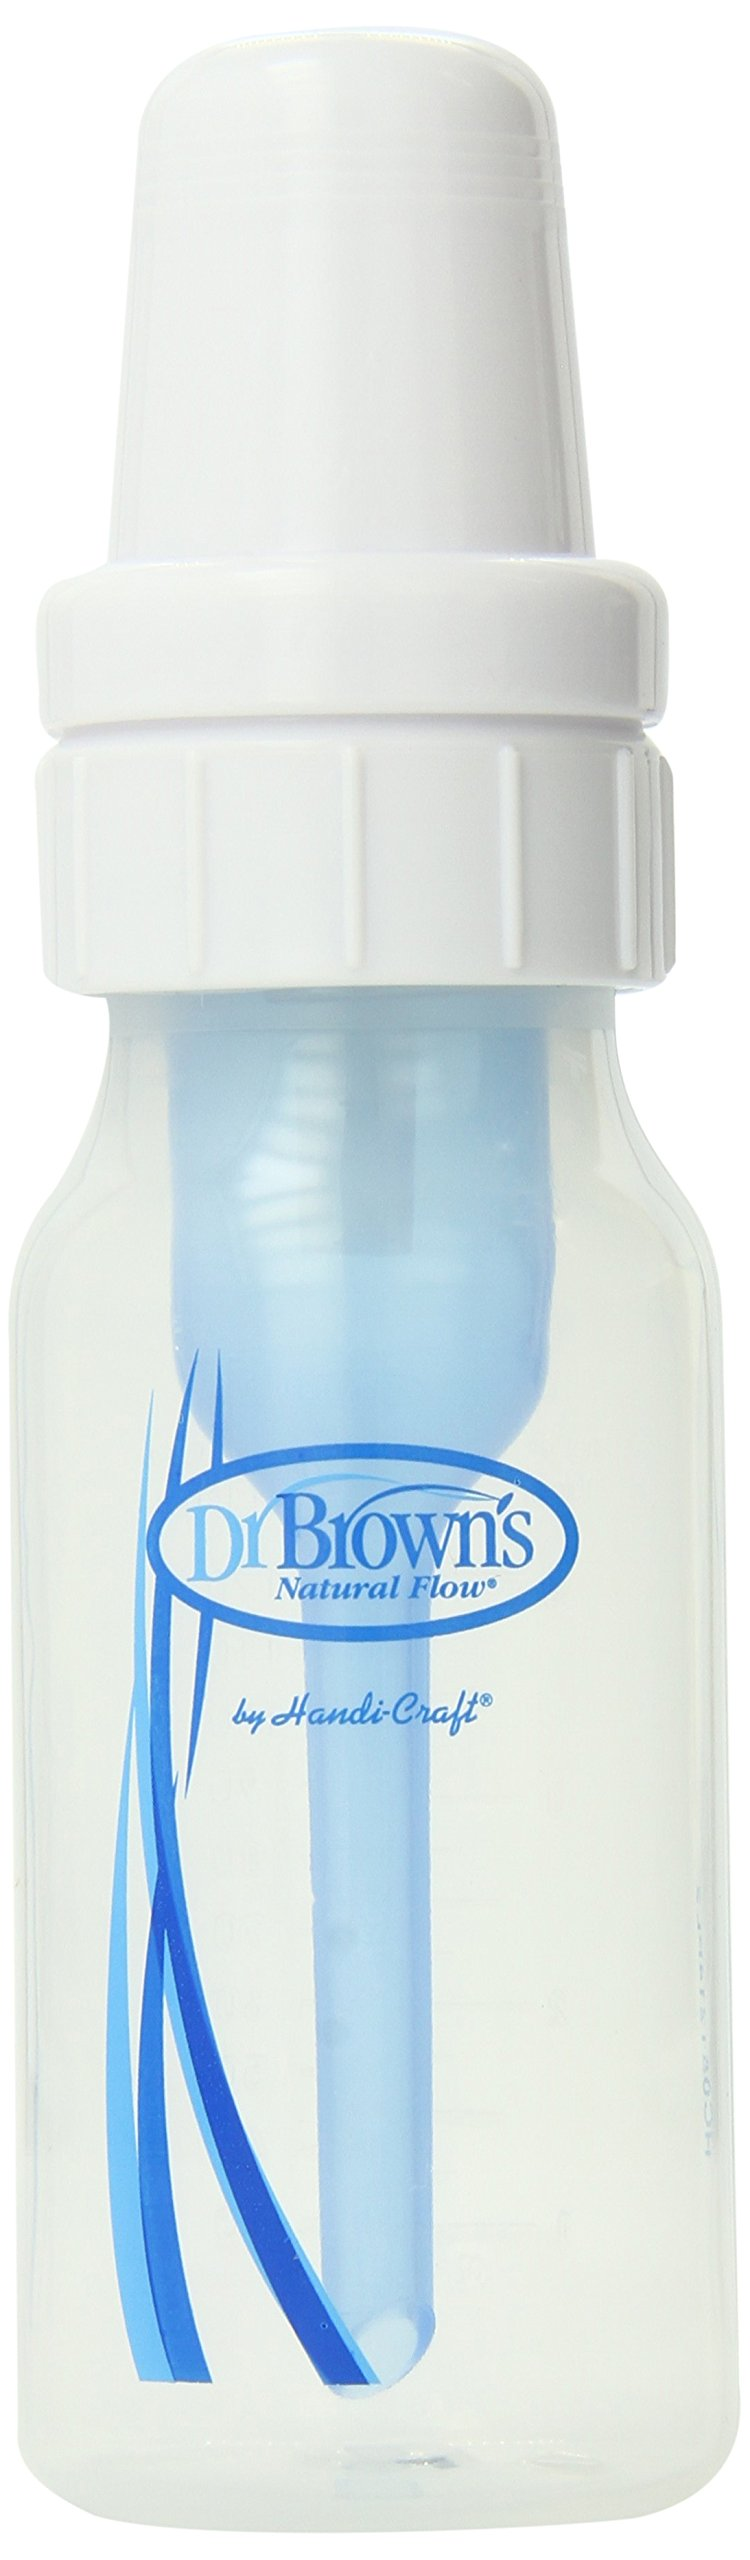 Dr. Brown's Original Bottle, 4 ounce, 4-Pack